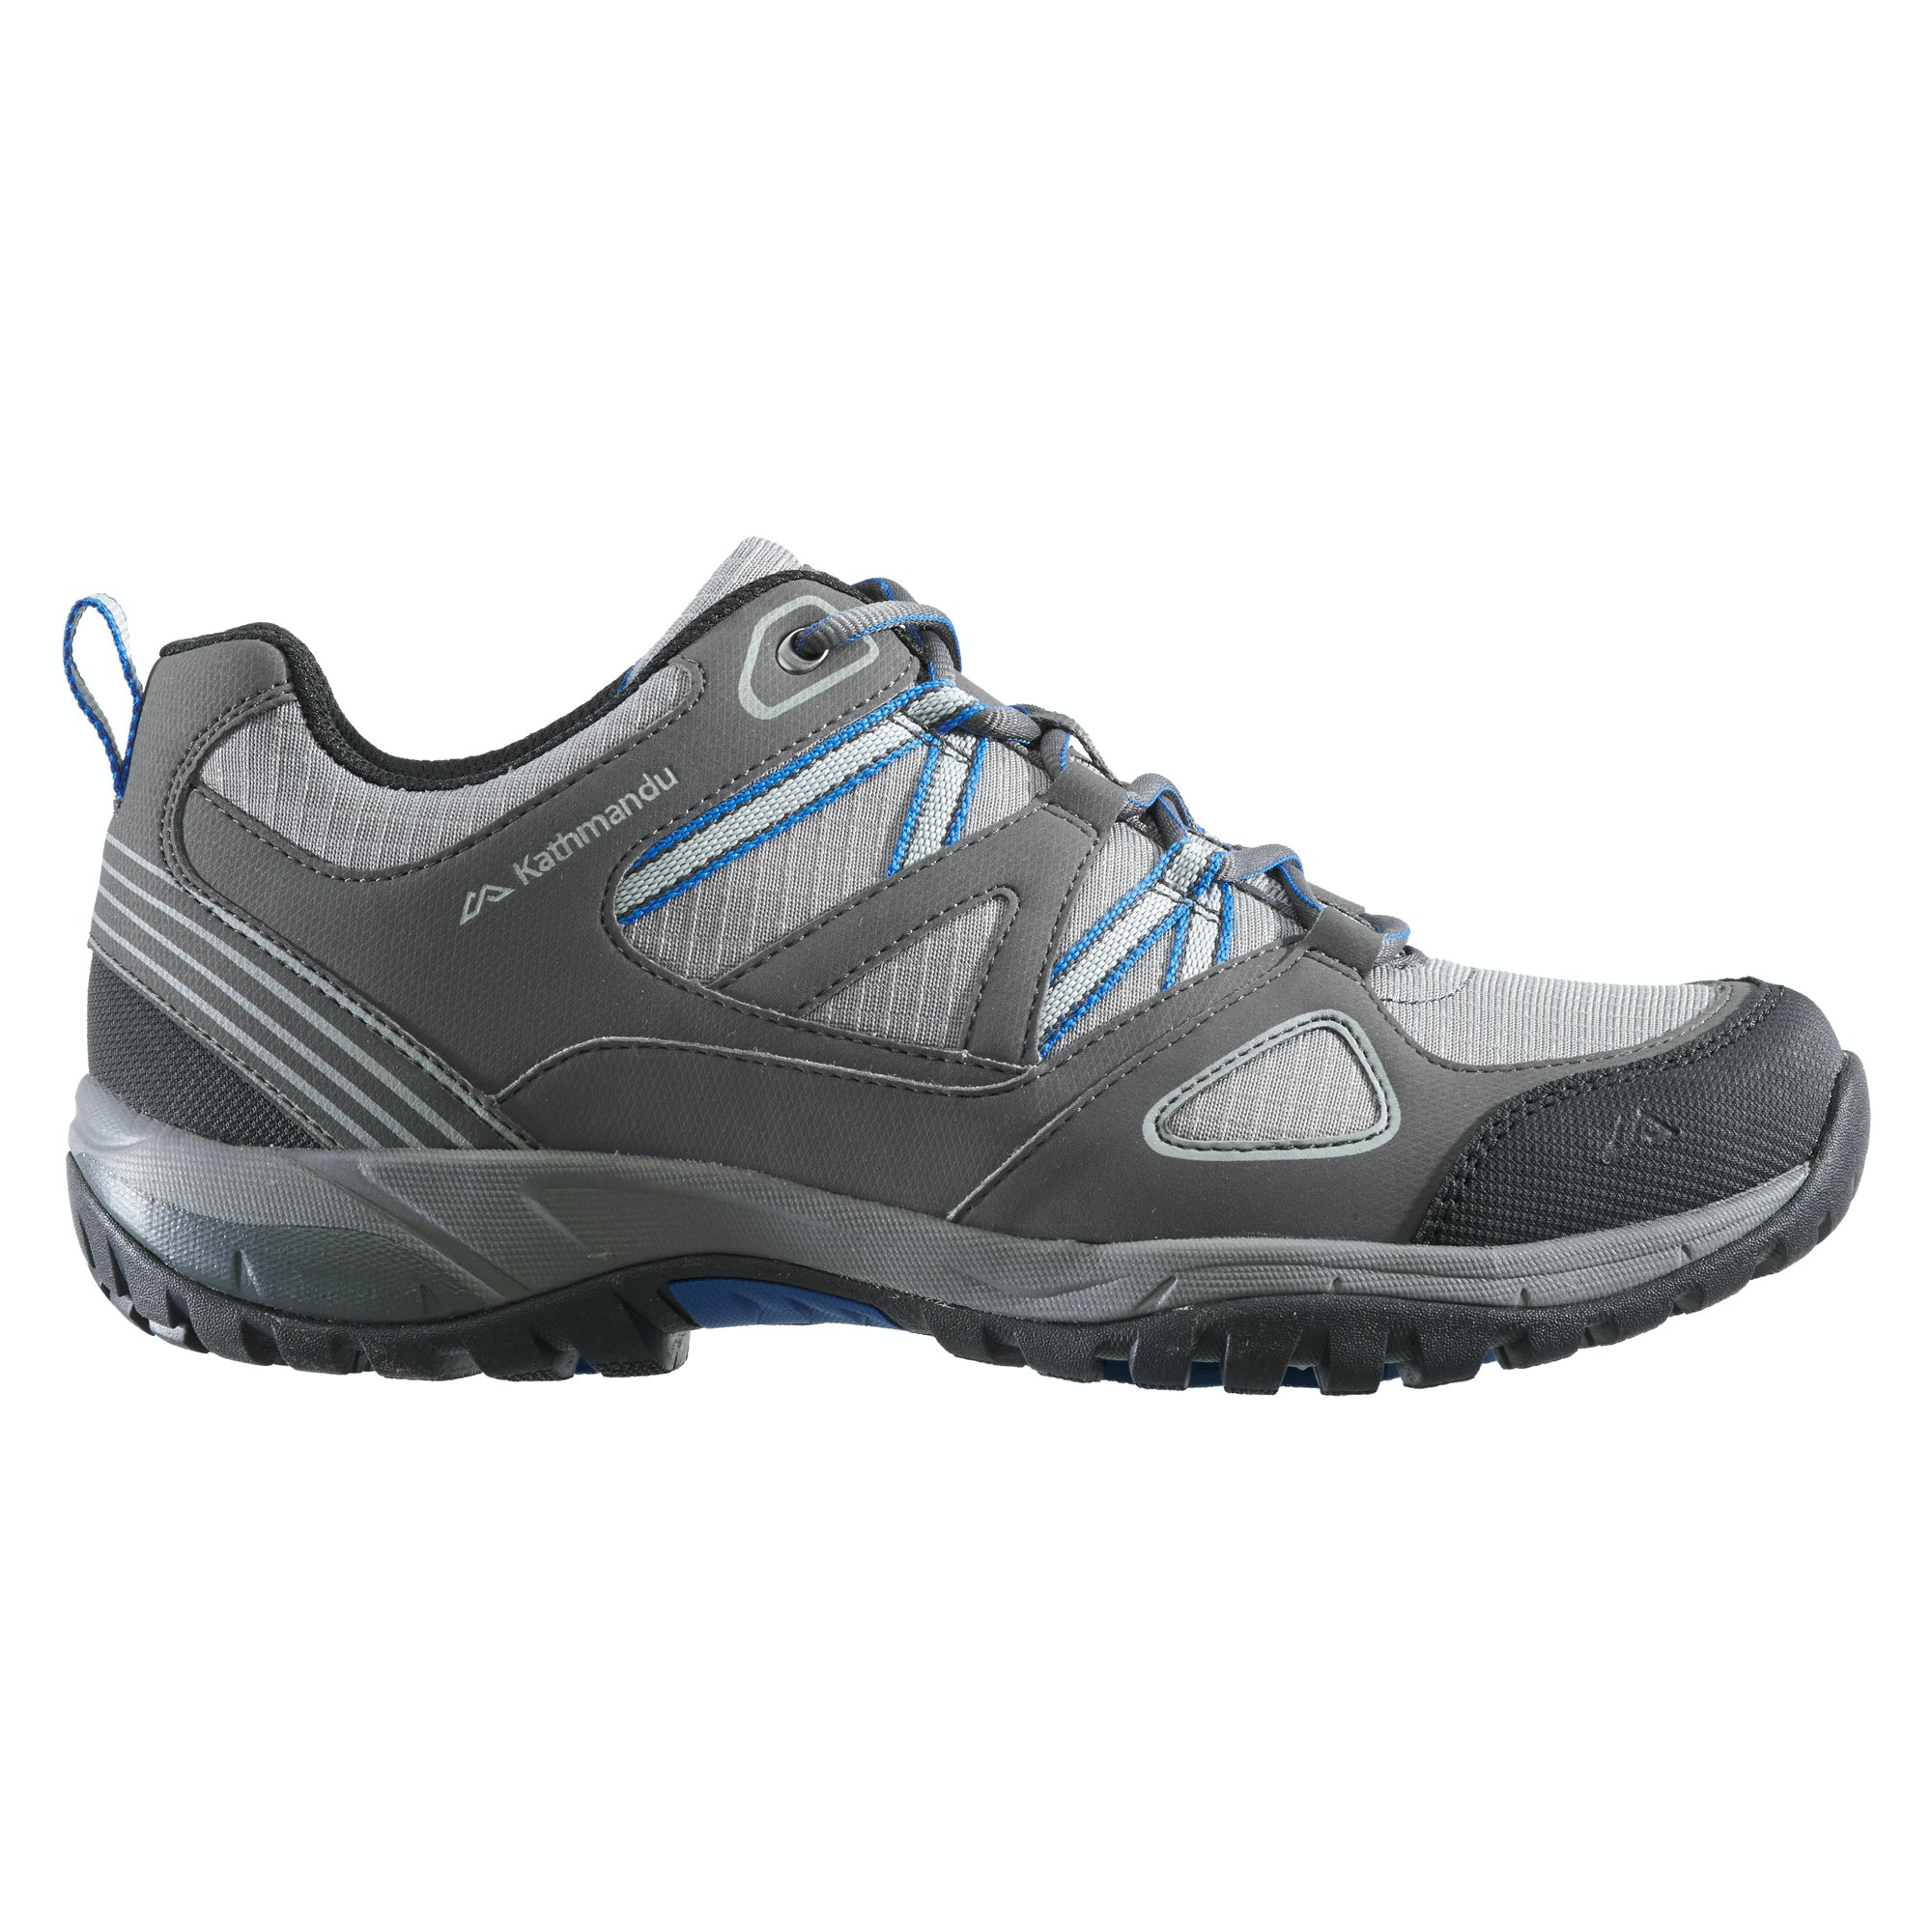 NEW-Kathmandu-Serpentine-II-Men-039-s-Lighweight-Durable-Hiking-Walking-Shoes thumbnail 10